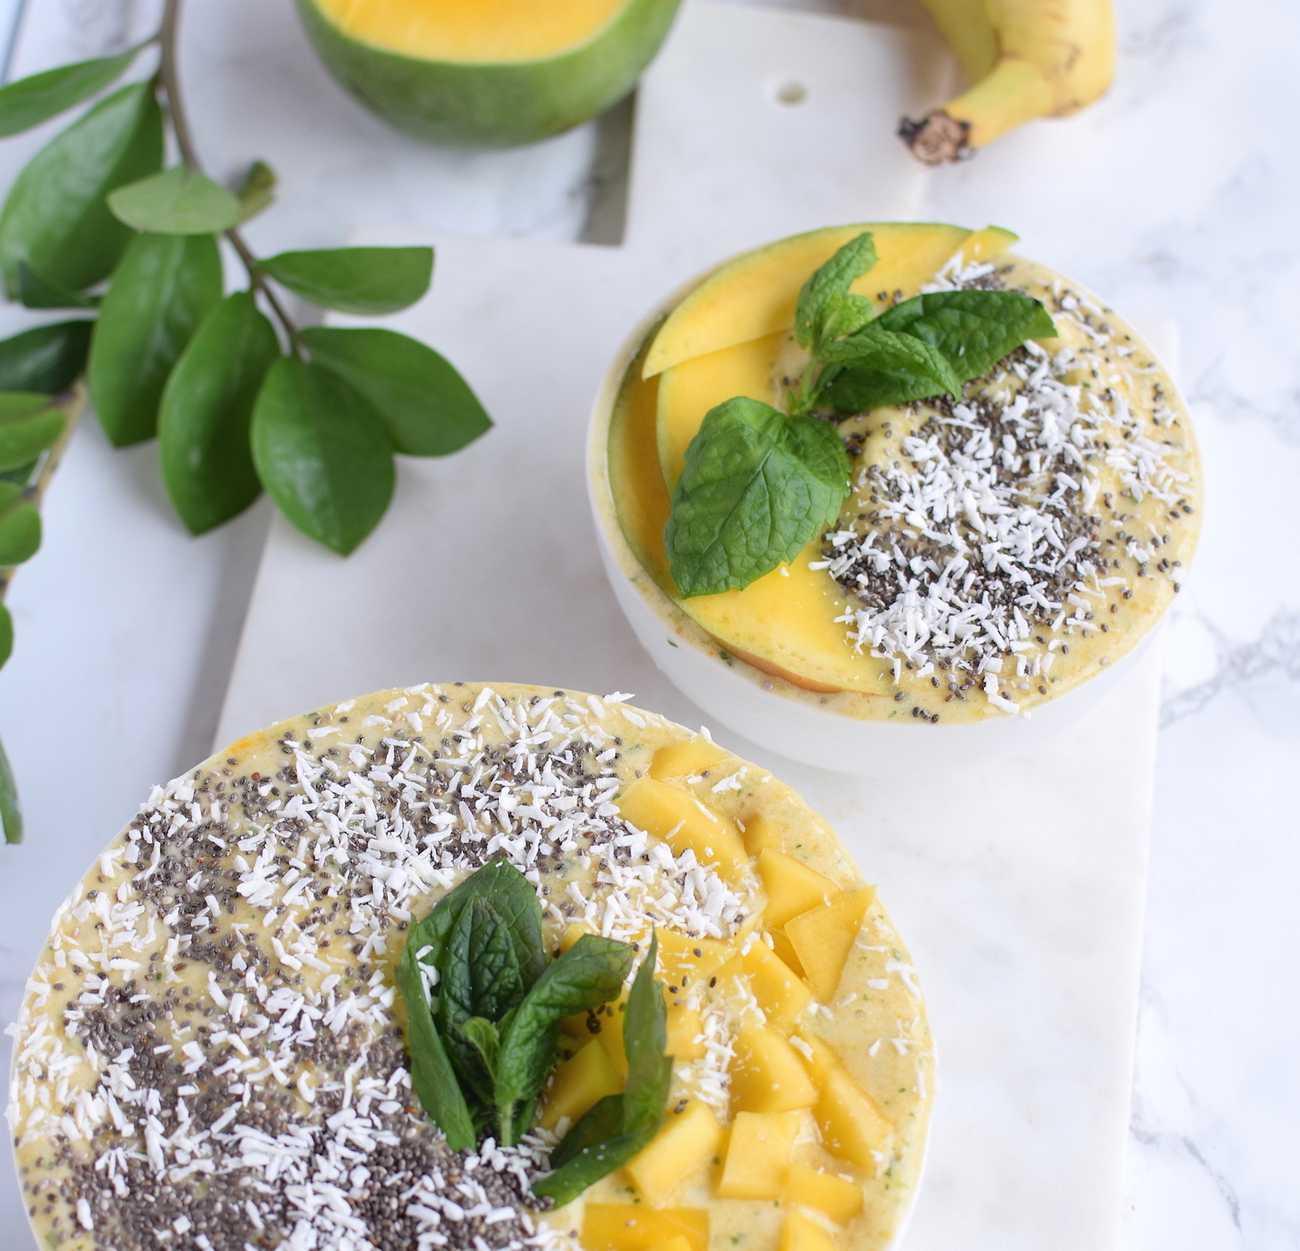 Mango- & myntasmoothie